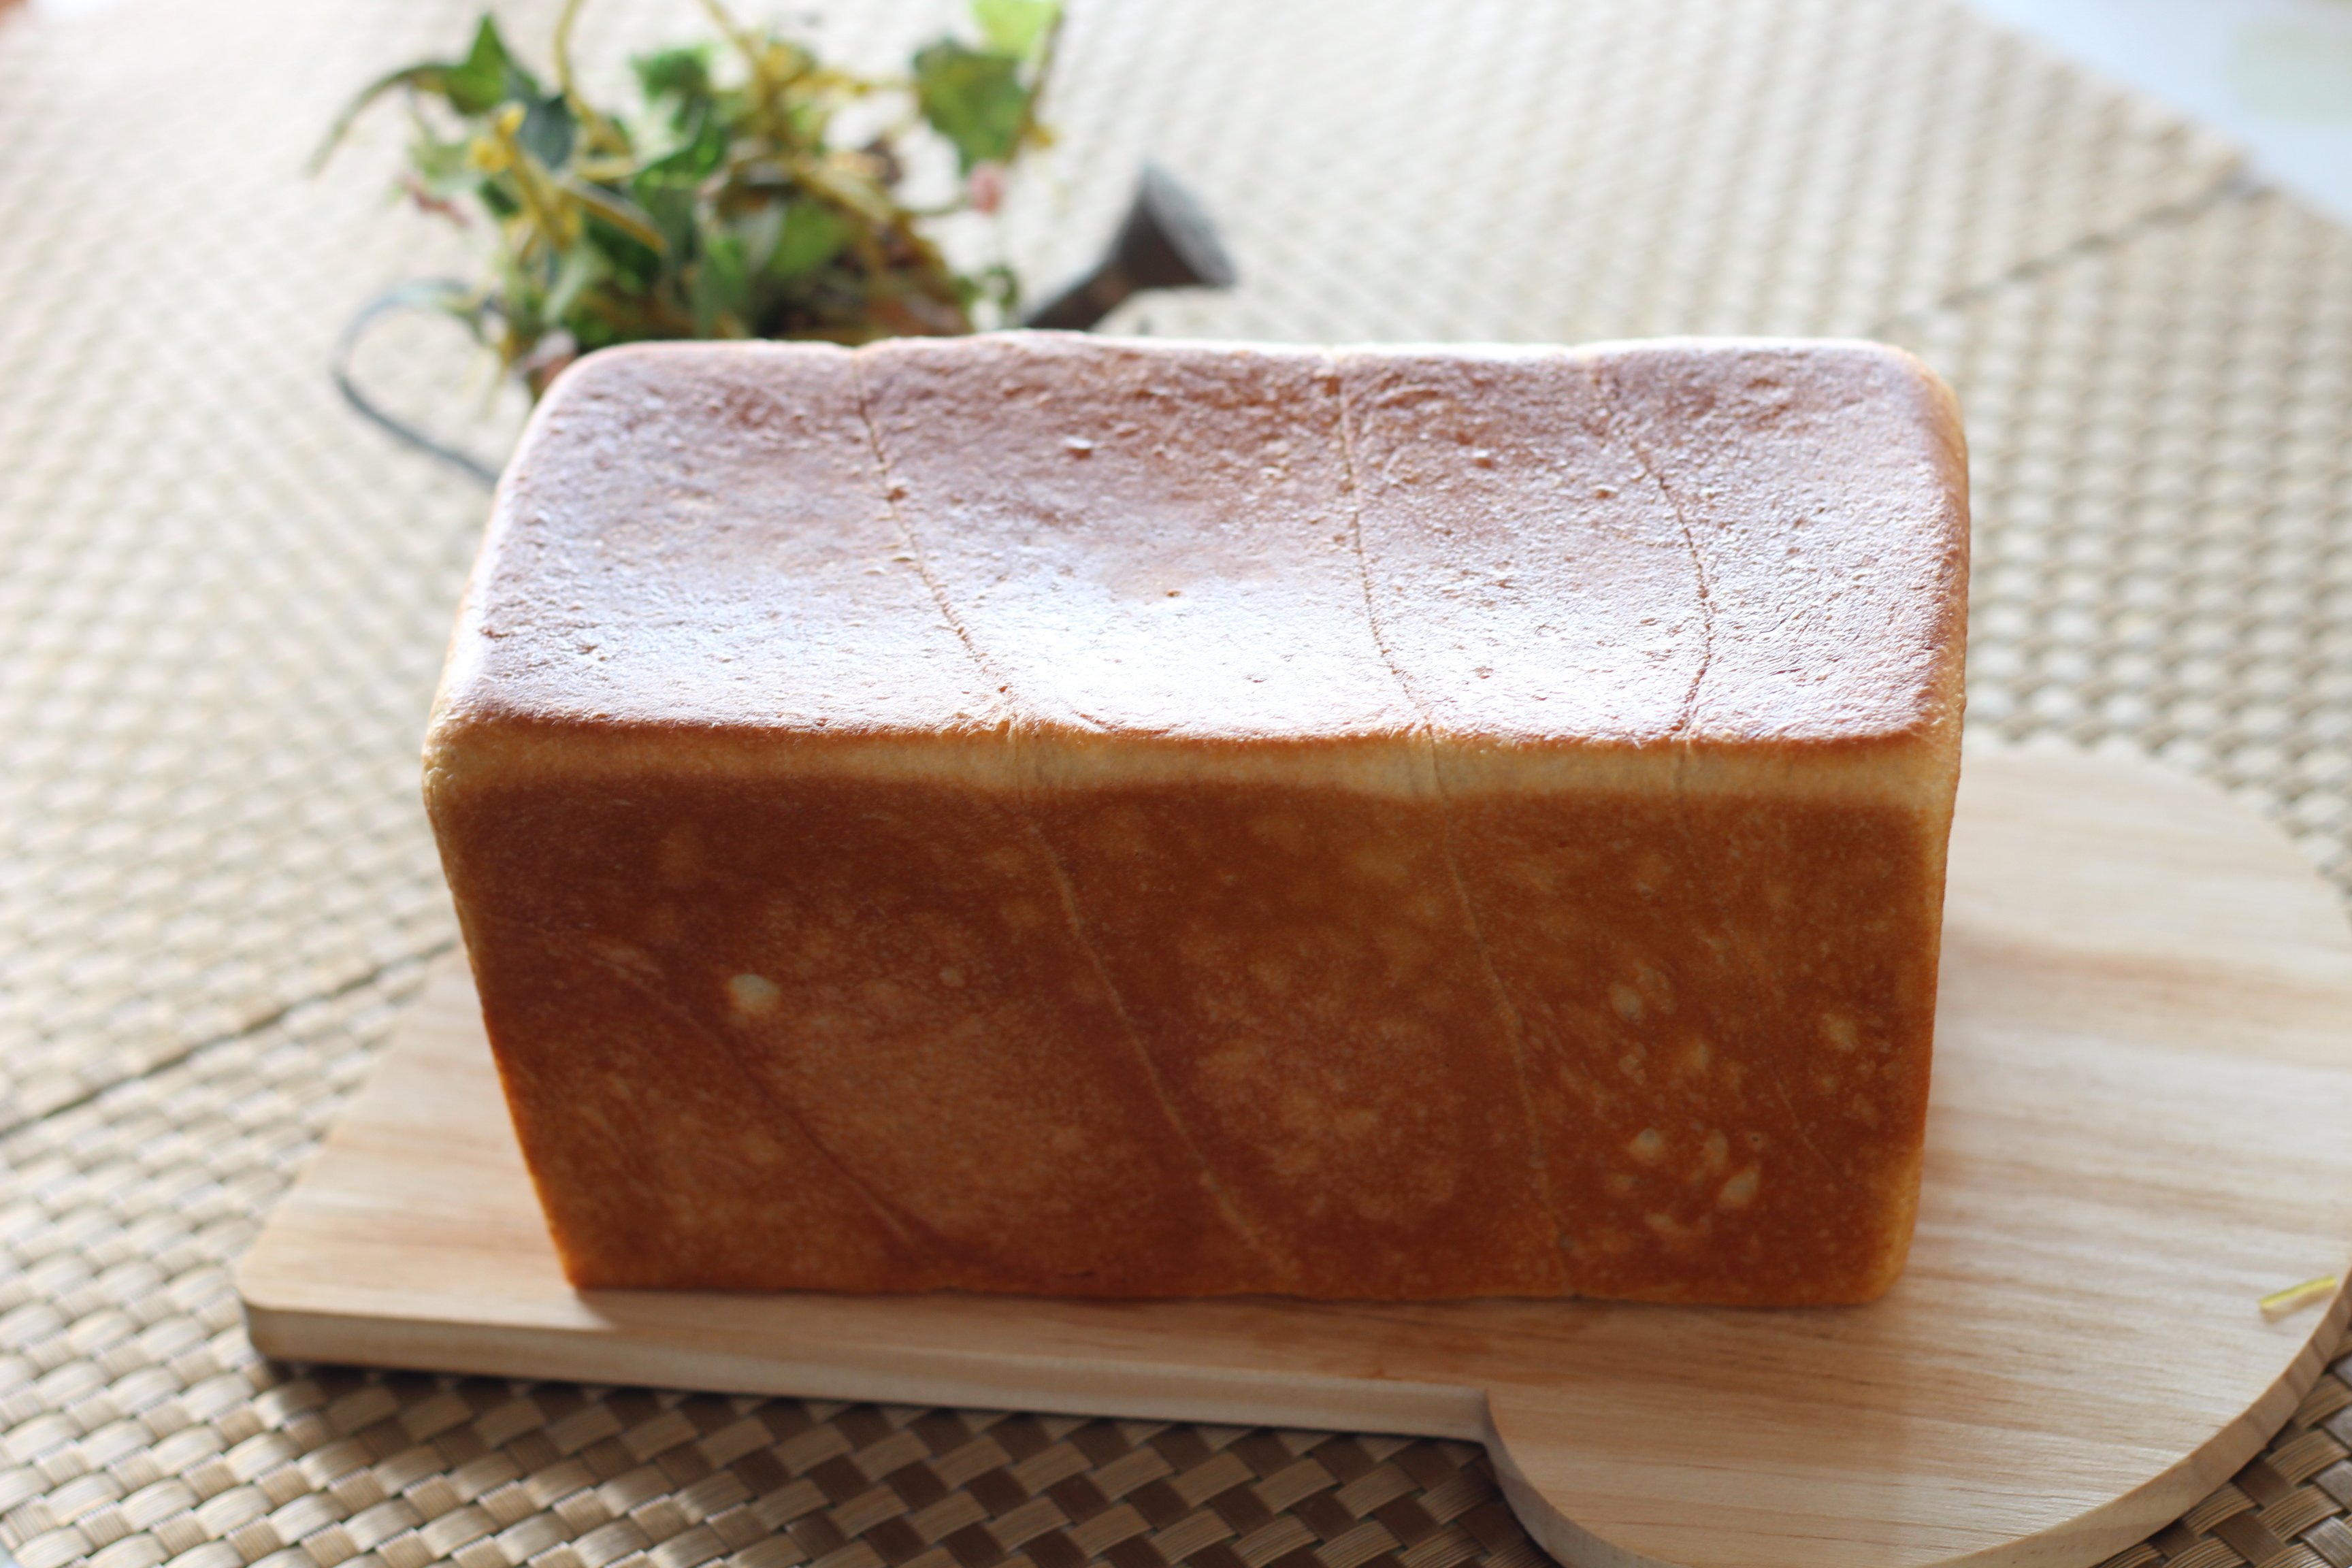 a-ta-sante糖質制限パン料理教室。京都江部粉糖質制限パンアドバンスコース最終メニュー『角食&crown 』出来上がっています。